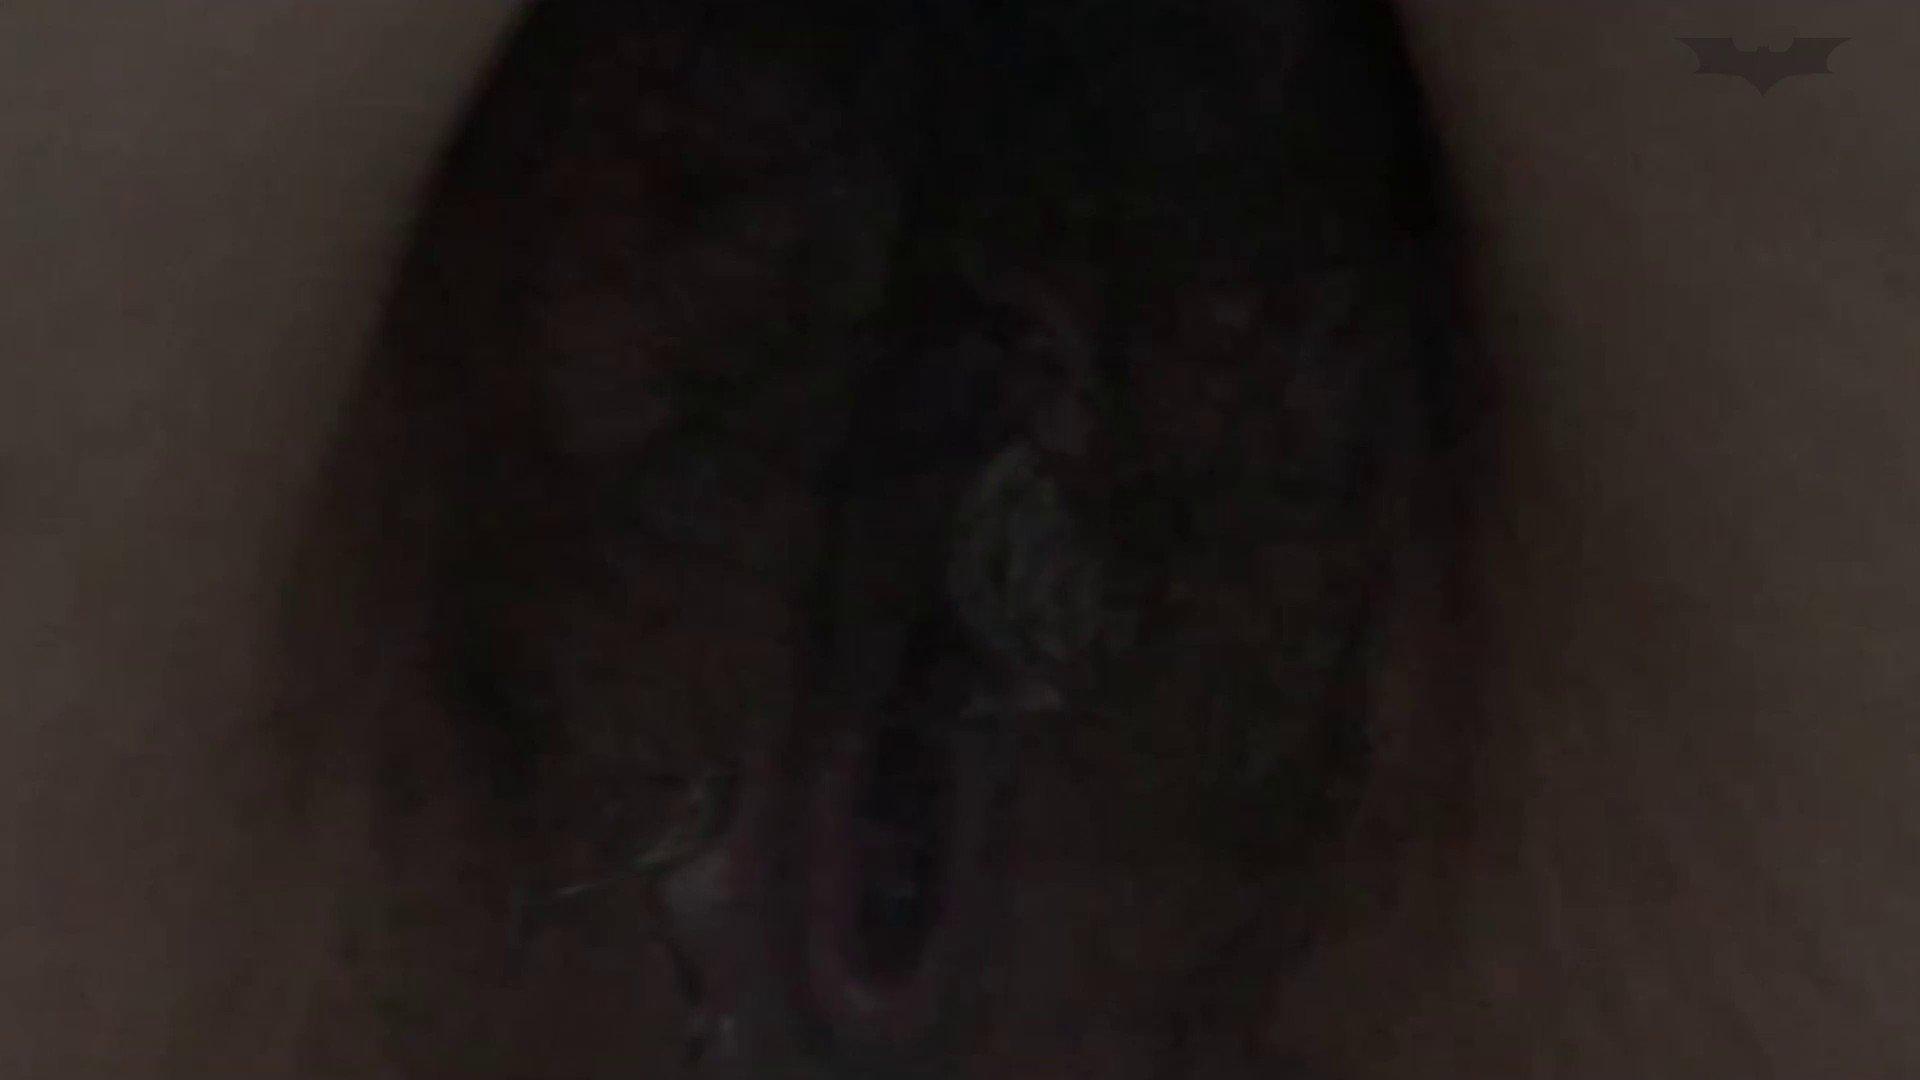 JD盗撮 美女の洗面所の秘密 Vol.65 盗撮編 すけべAV動画紹介 111枚 37